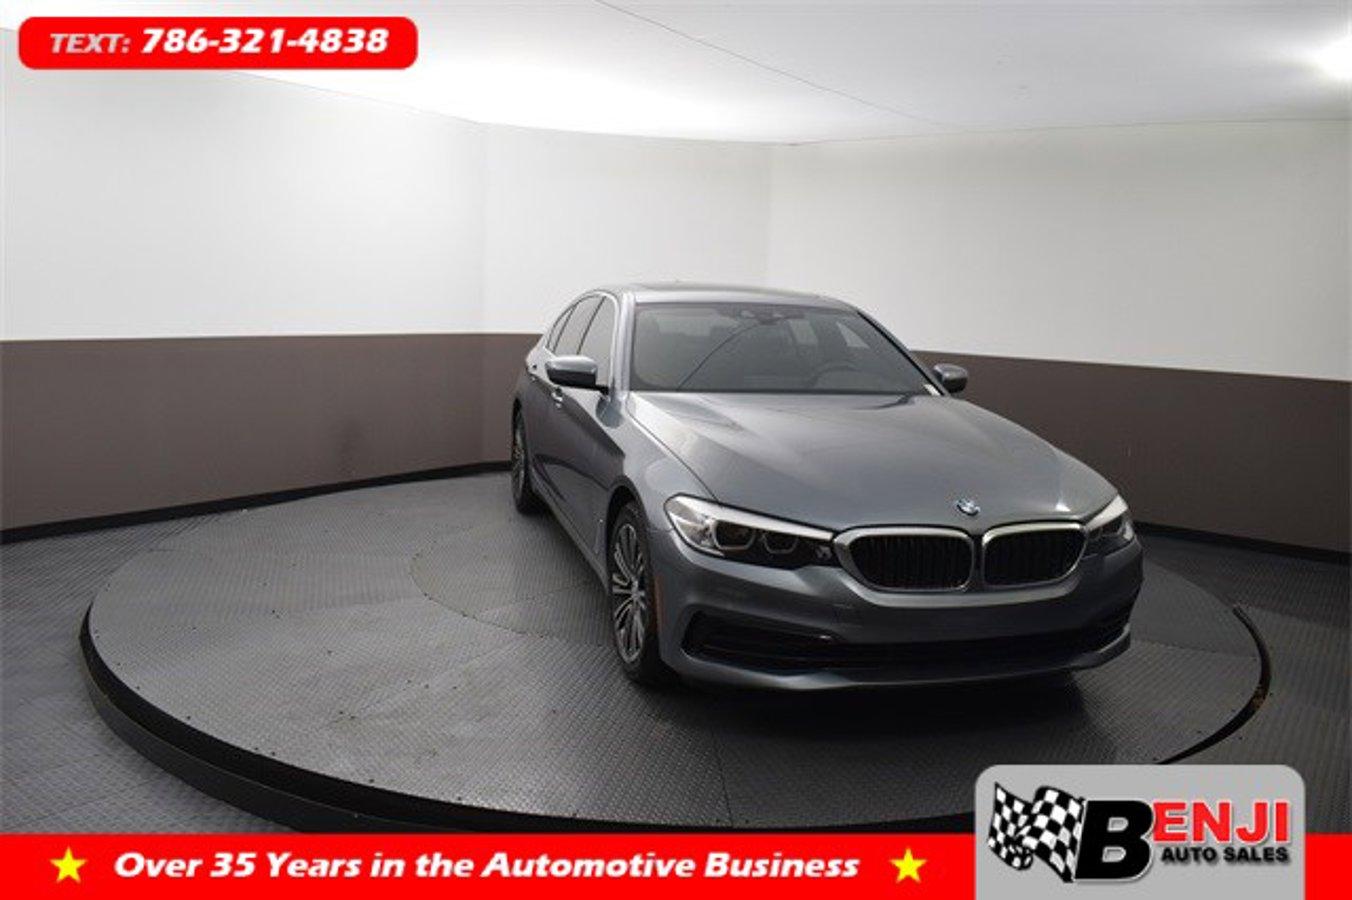 Used BMW 5-SERIES 2019 BROWARD 530I